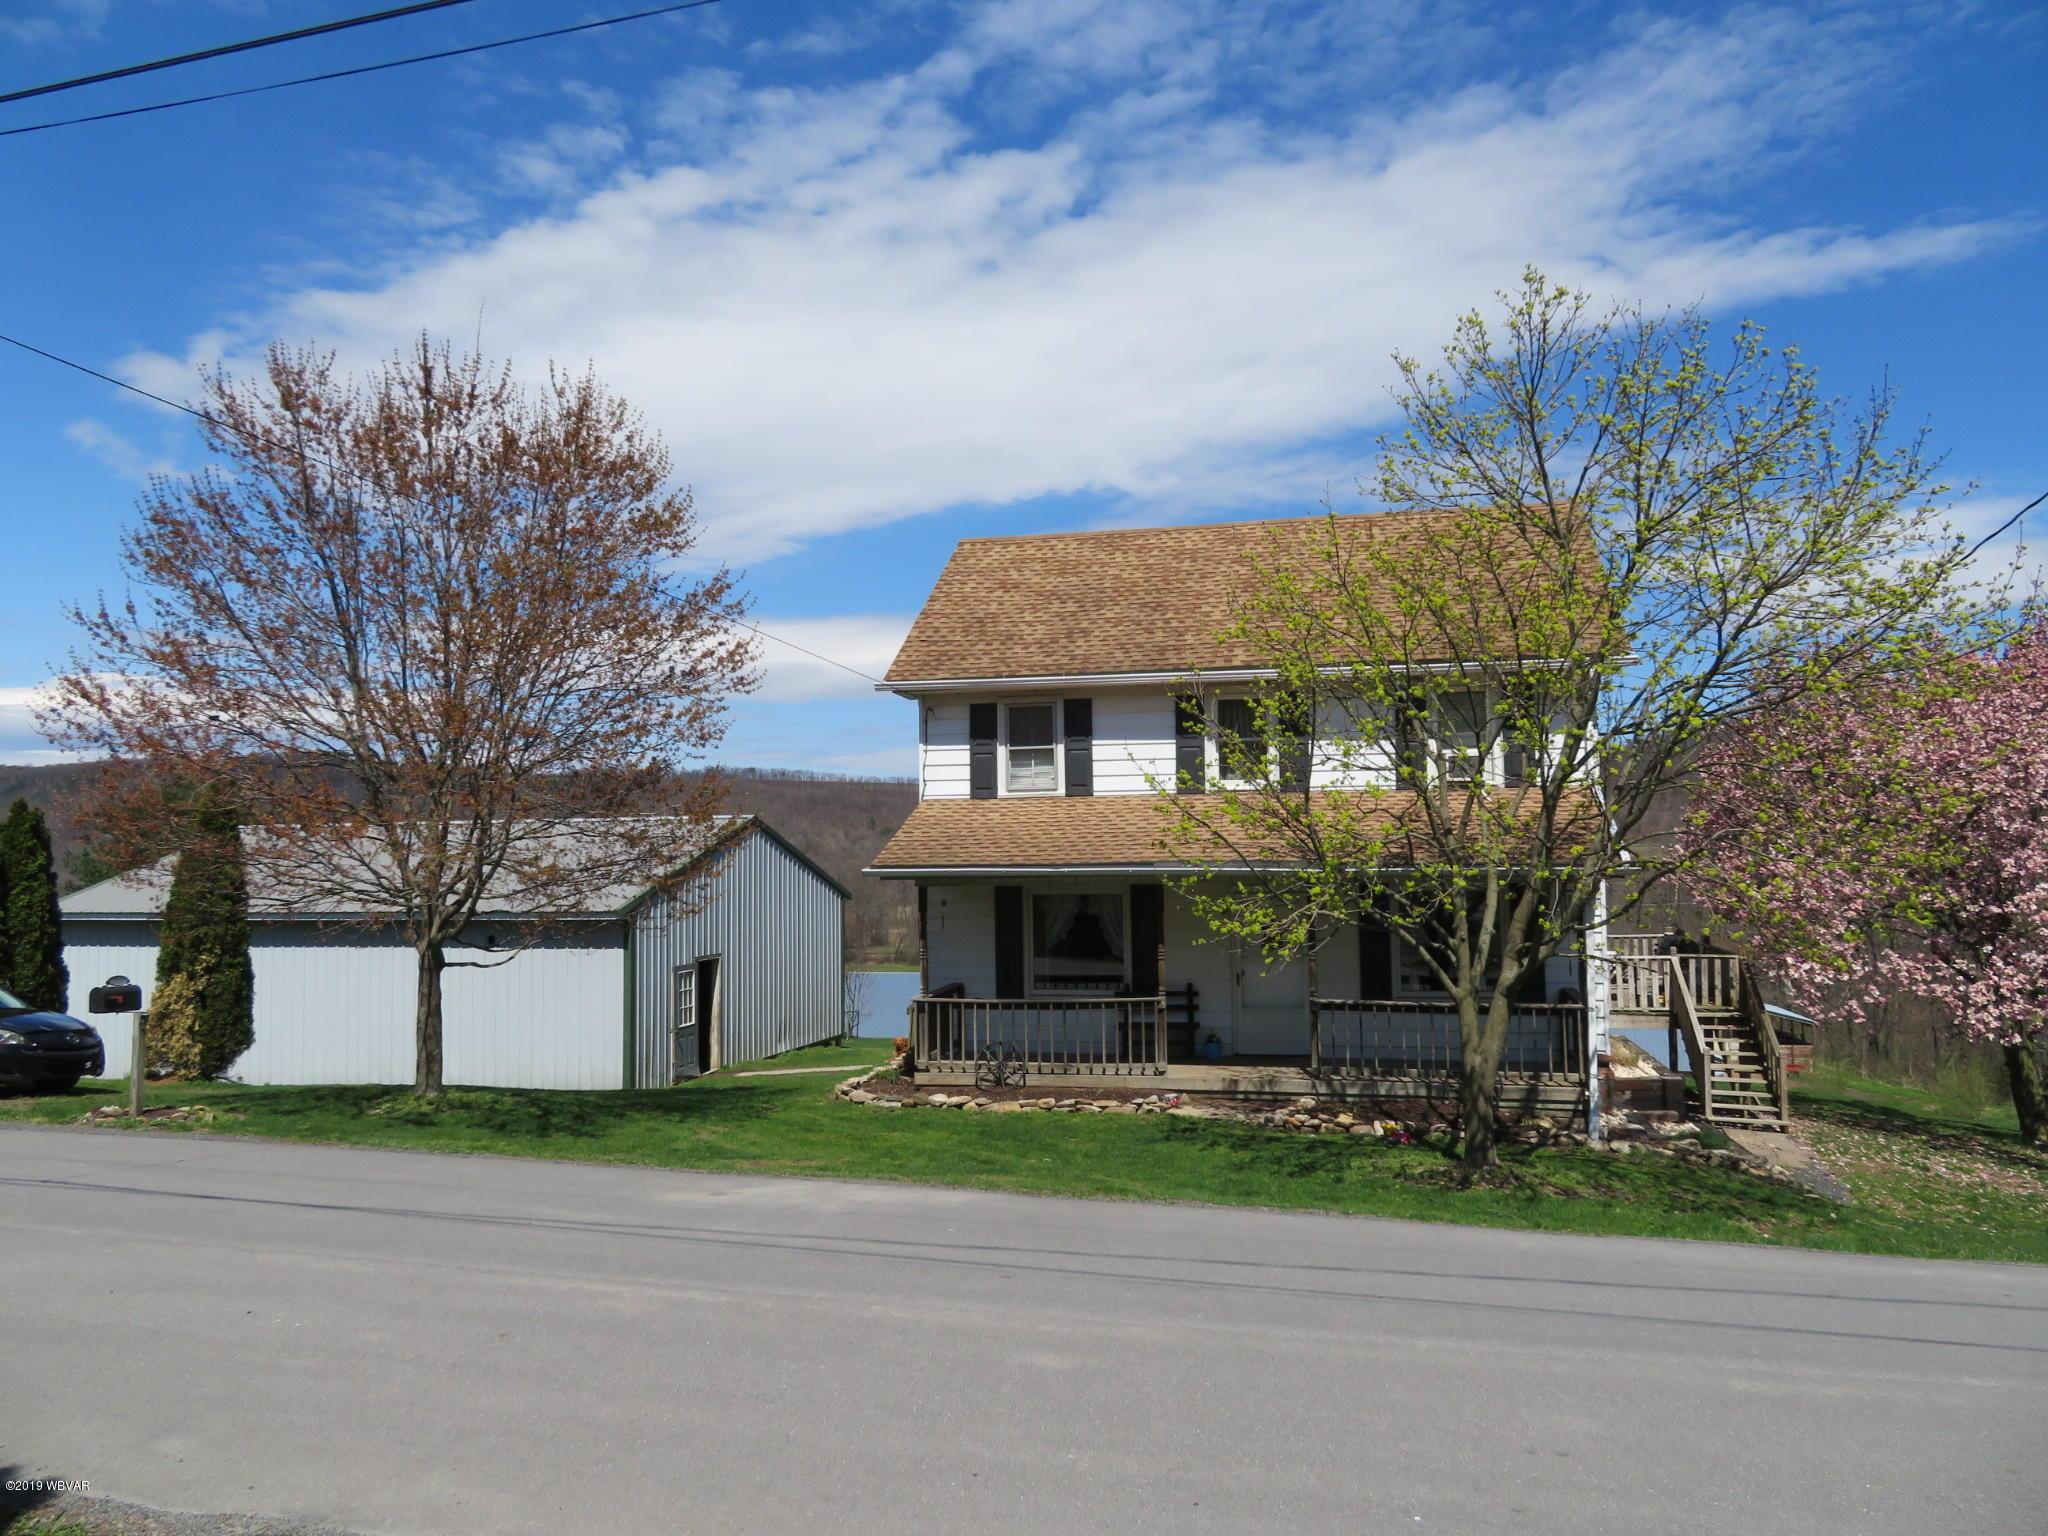 1553 SHAMROCK ROAD,Paxinos,PA 17860,5 Bedrooms Bedrooms,1 BathroomBathrooms,Farm,SHAMROCK,WB-87030